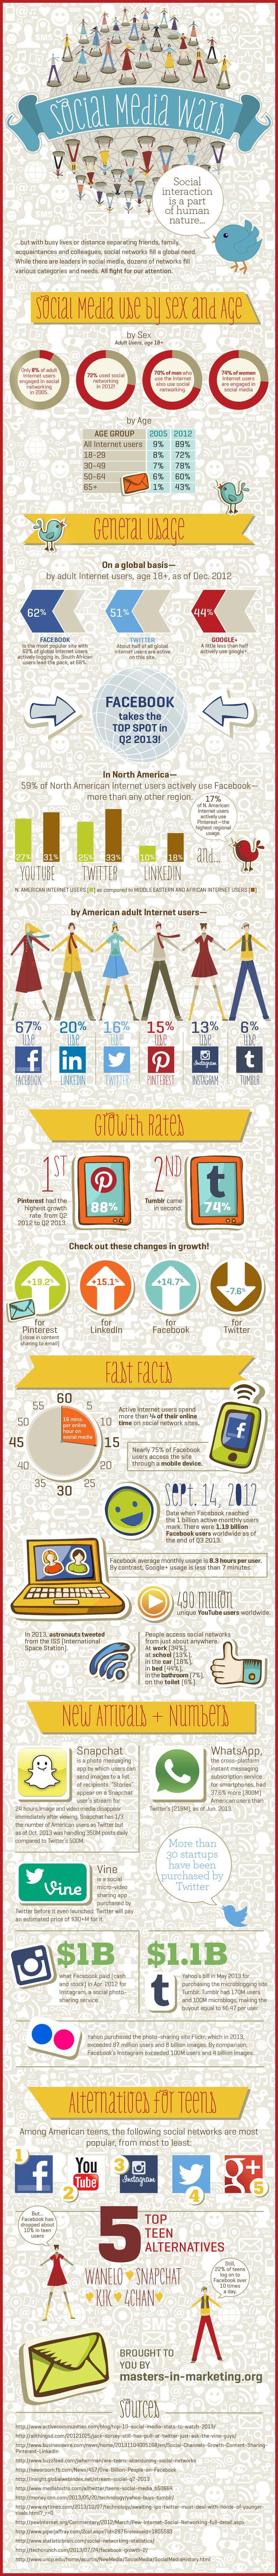 Unique Infographic Design, Social Media Wars @chisu26 #Infographic #Design  (http://www.pinterest.com/aldenchong/)